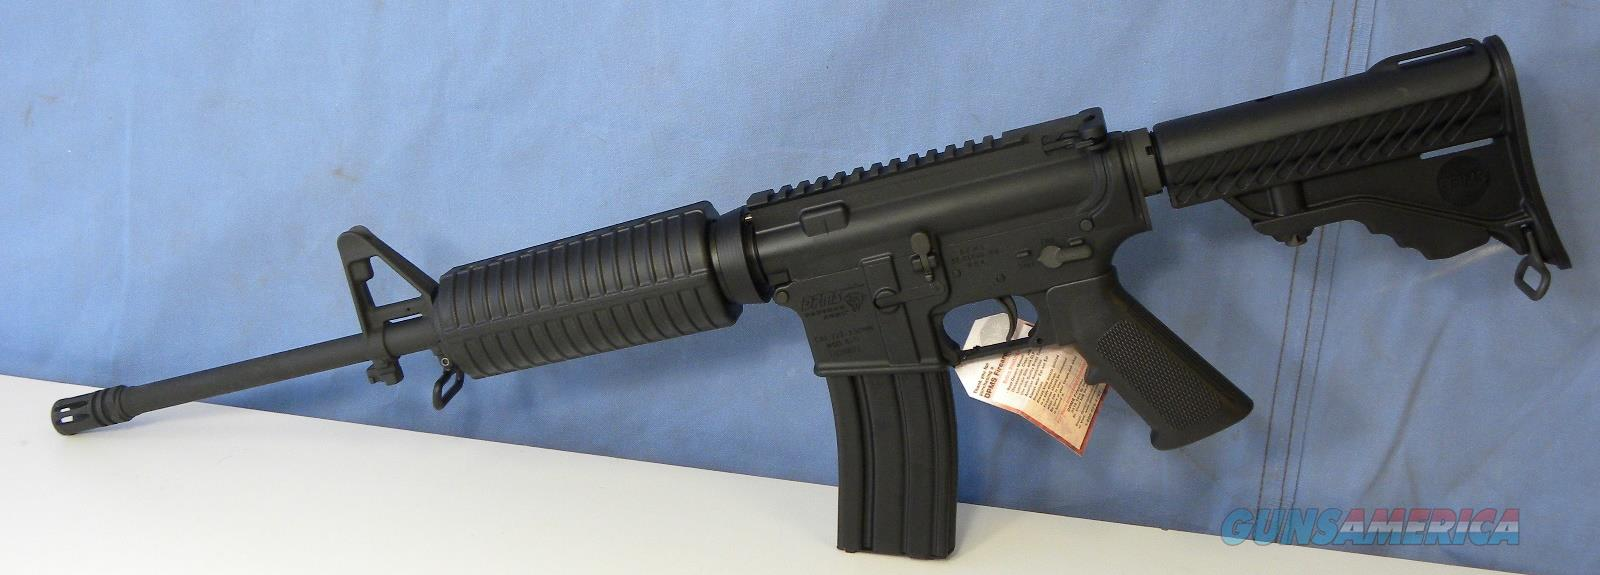 DPMS A3 Lite 16   Guns > Rifles > DPMS - Panther Arms > Complete Rifle